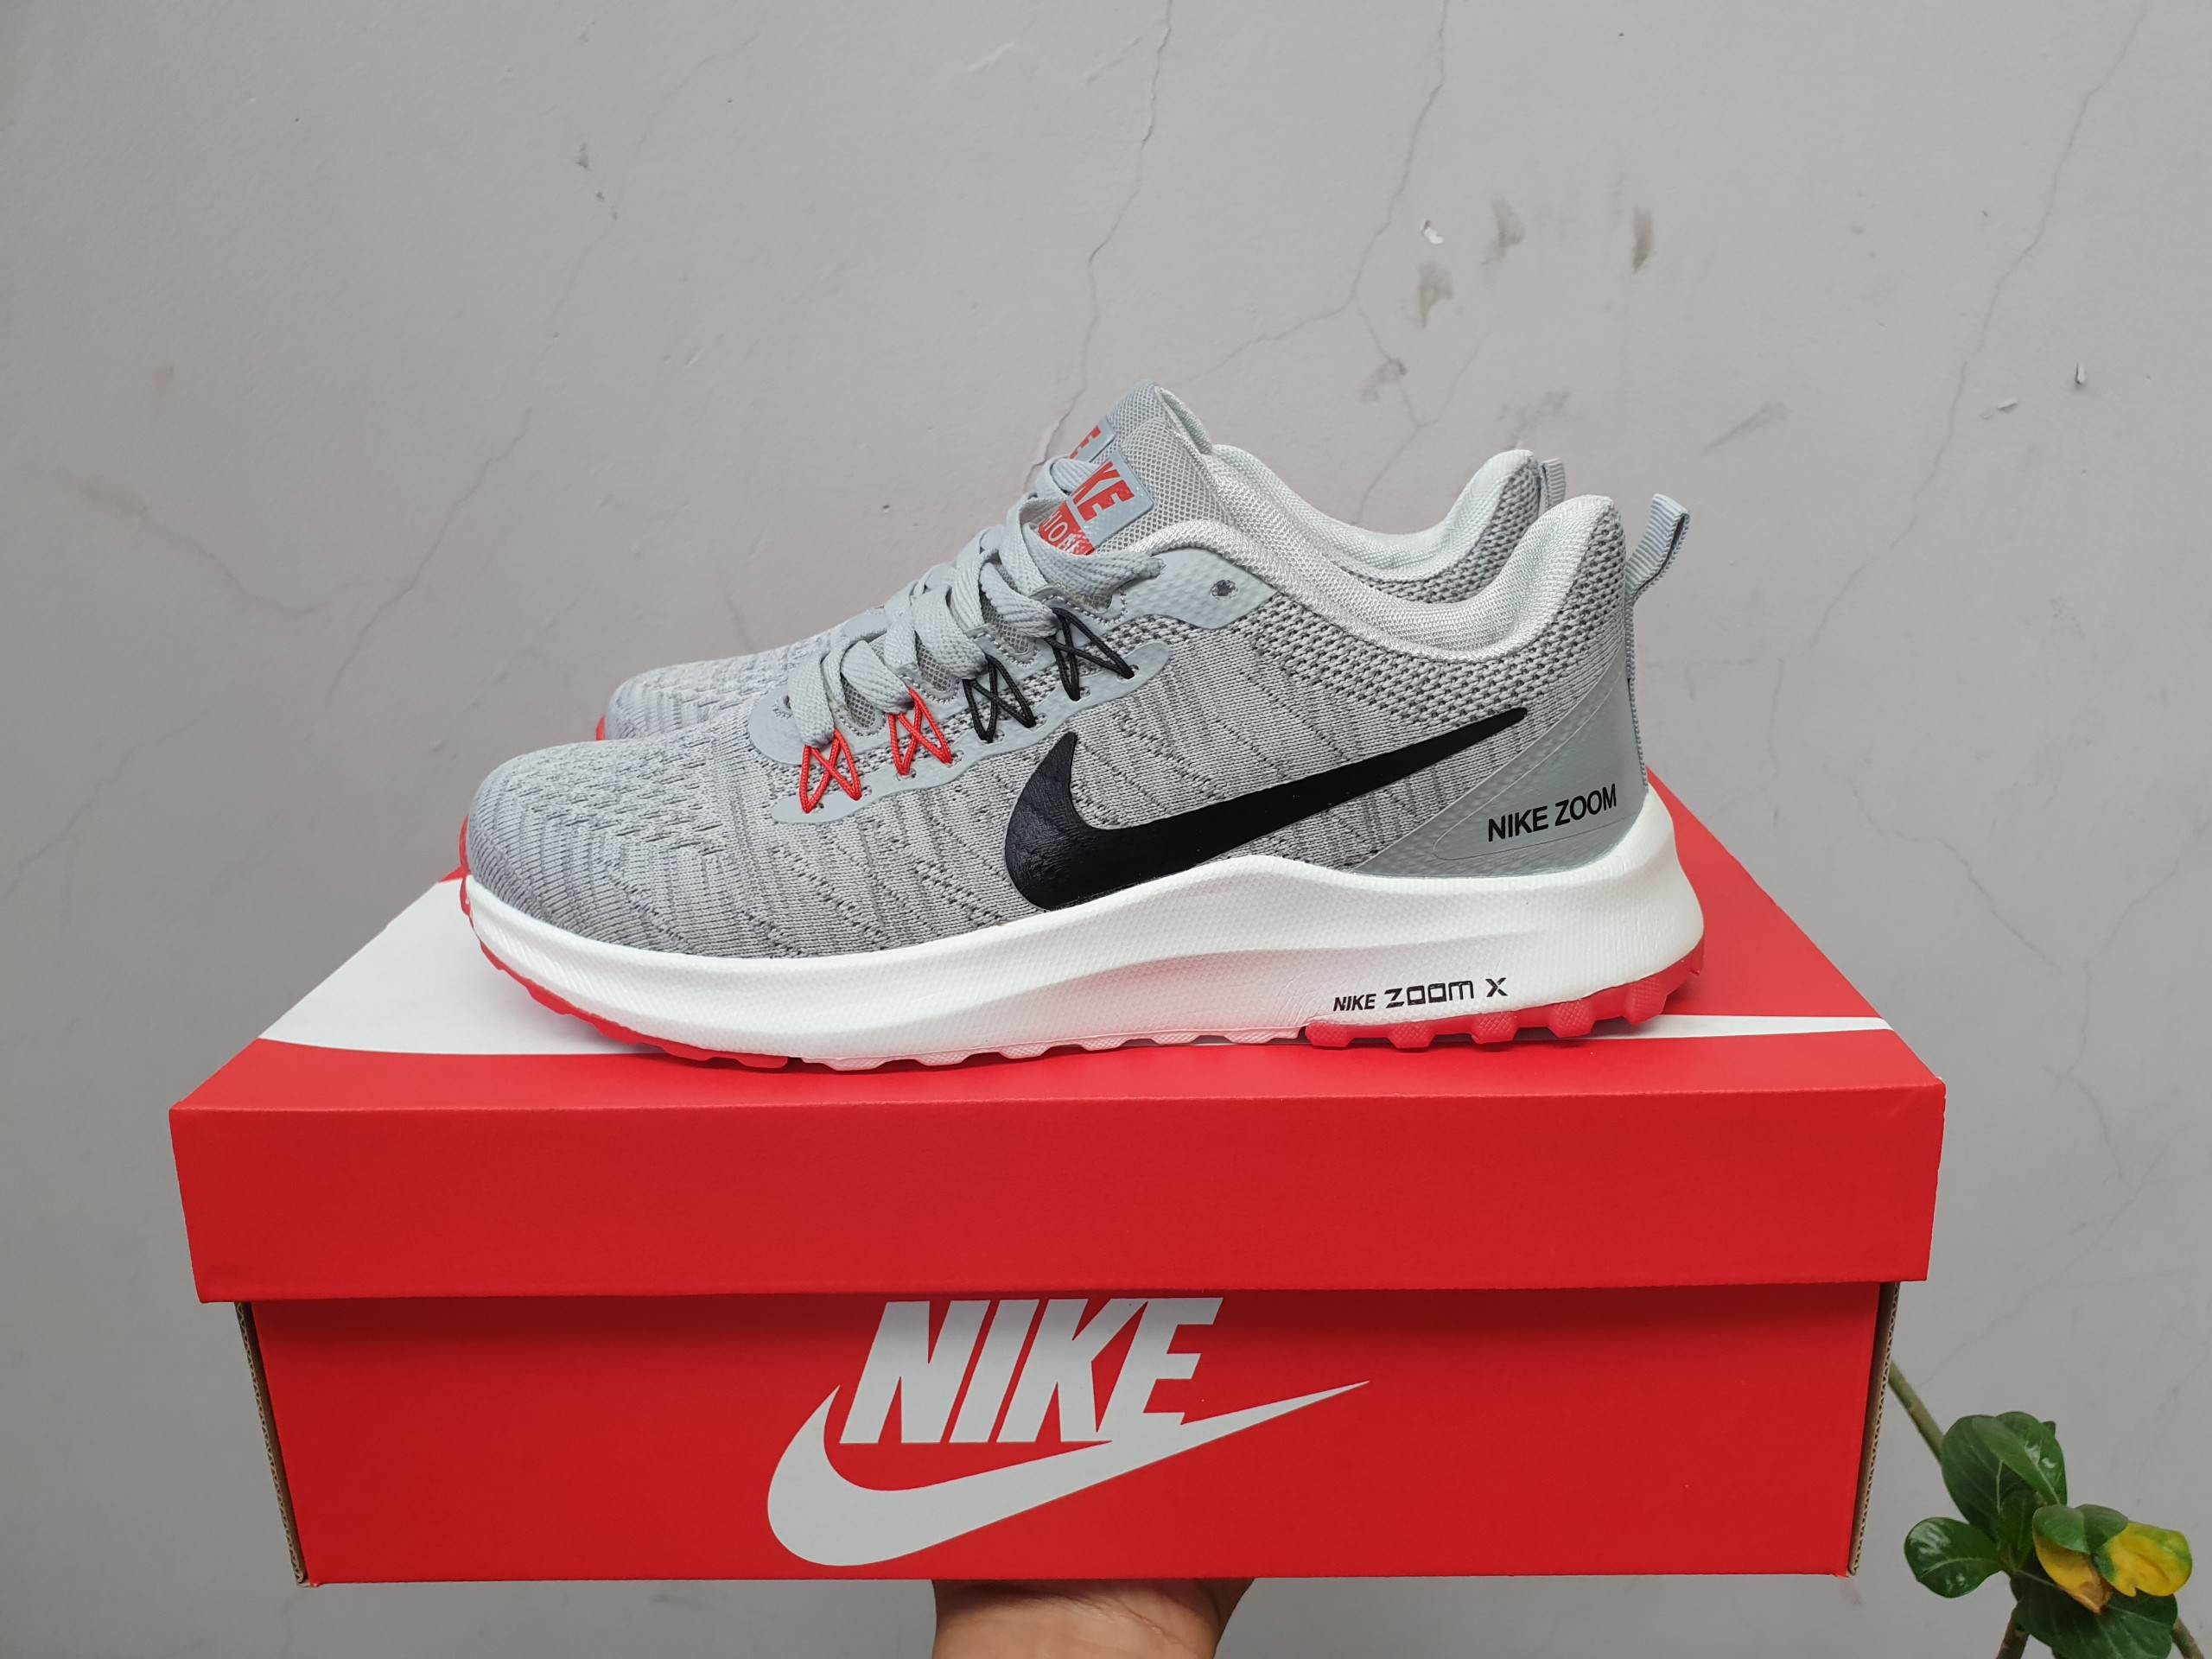 Giày Nike Zoom 04 xám